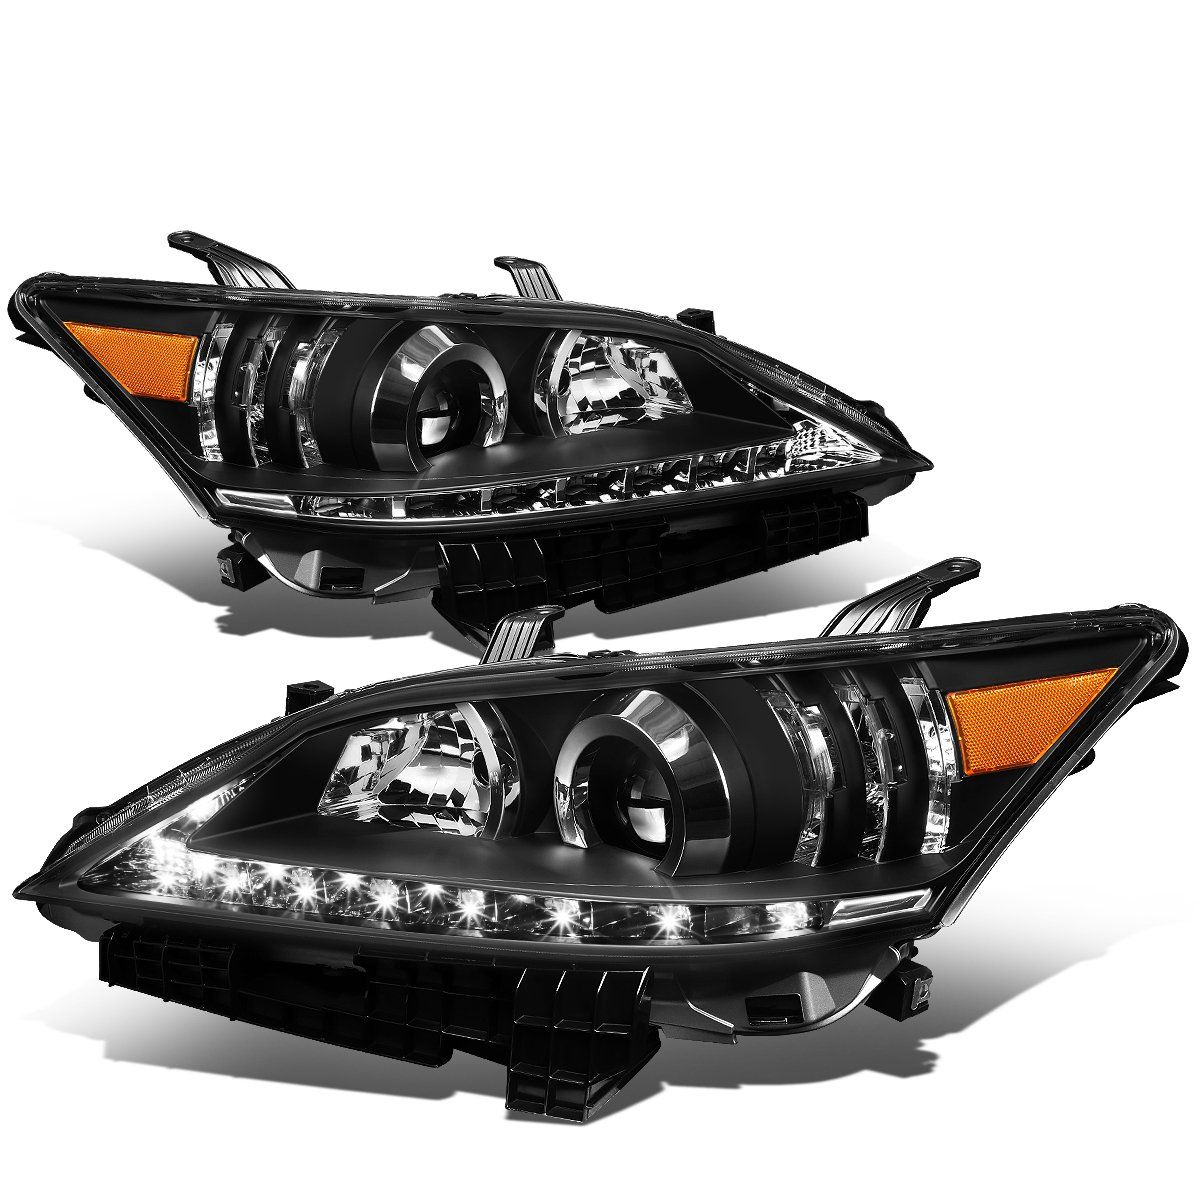 07 12 Lexus Es350 Led Drl Projector Headlights Black Housing Projector Headlights Lexus Headlights